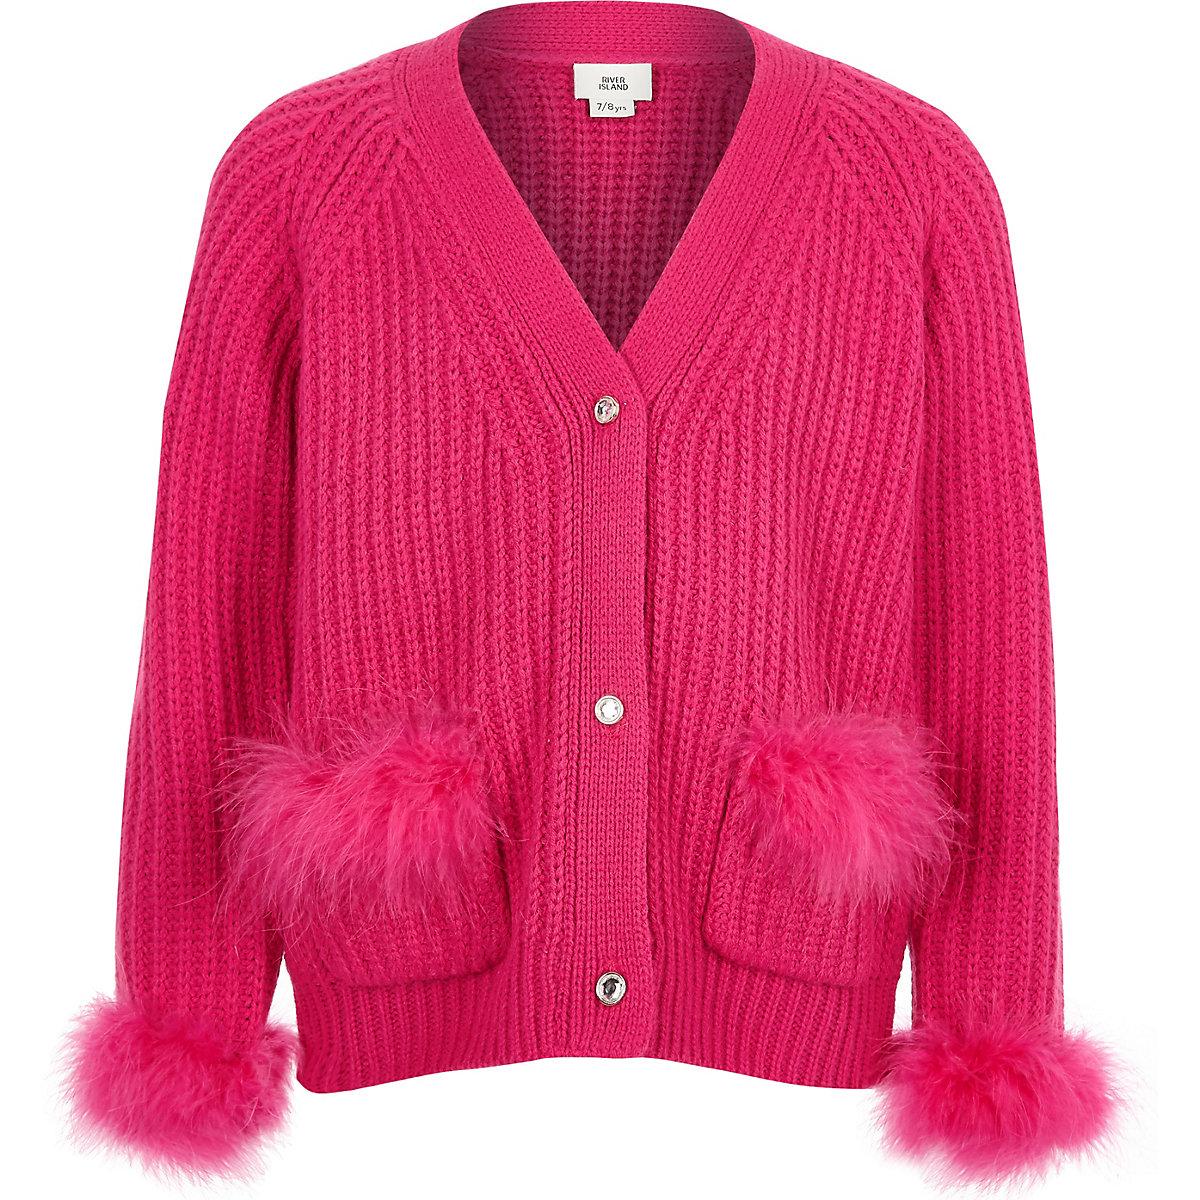 Girls pink feather trim knit cardigan